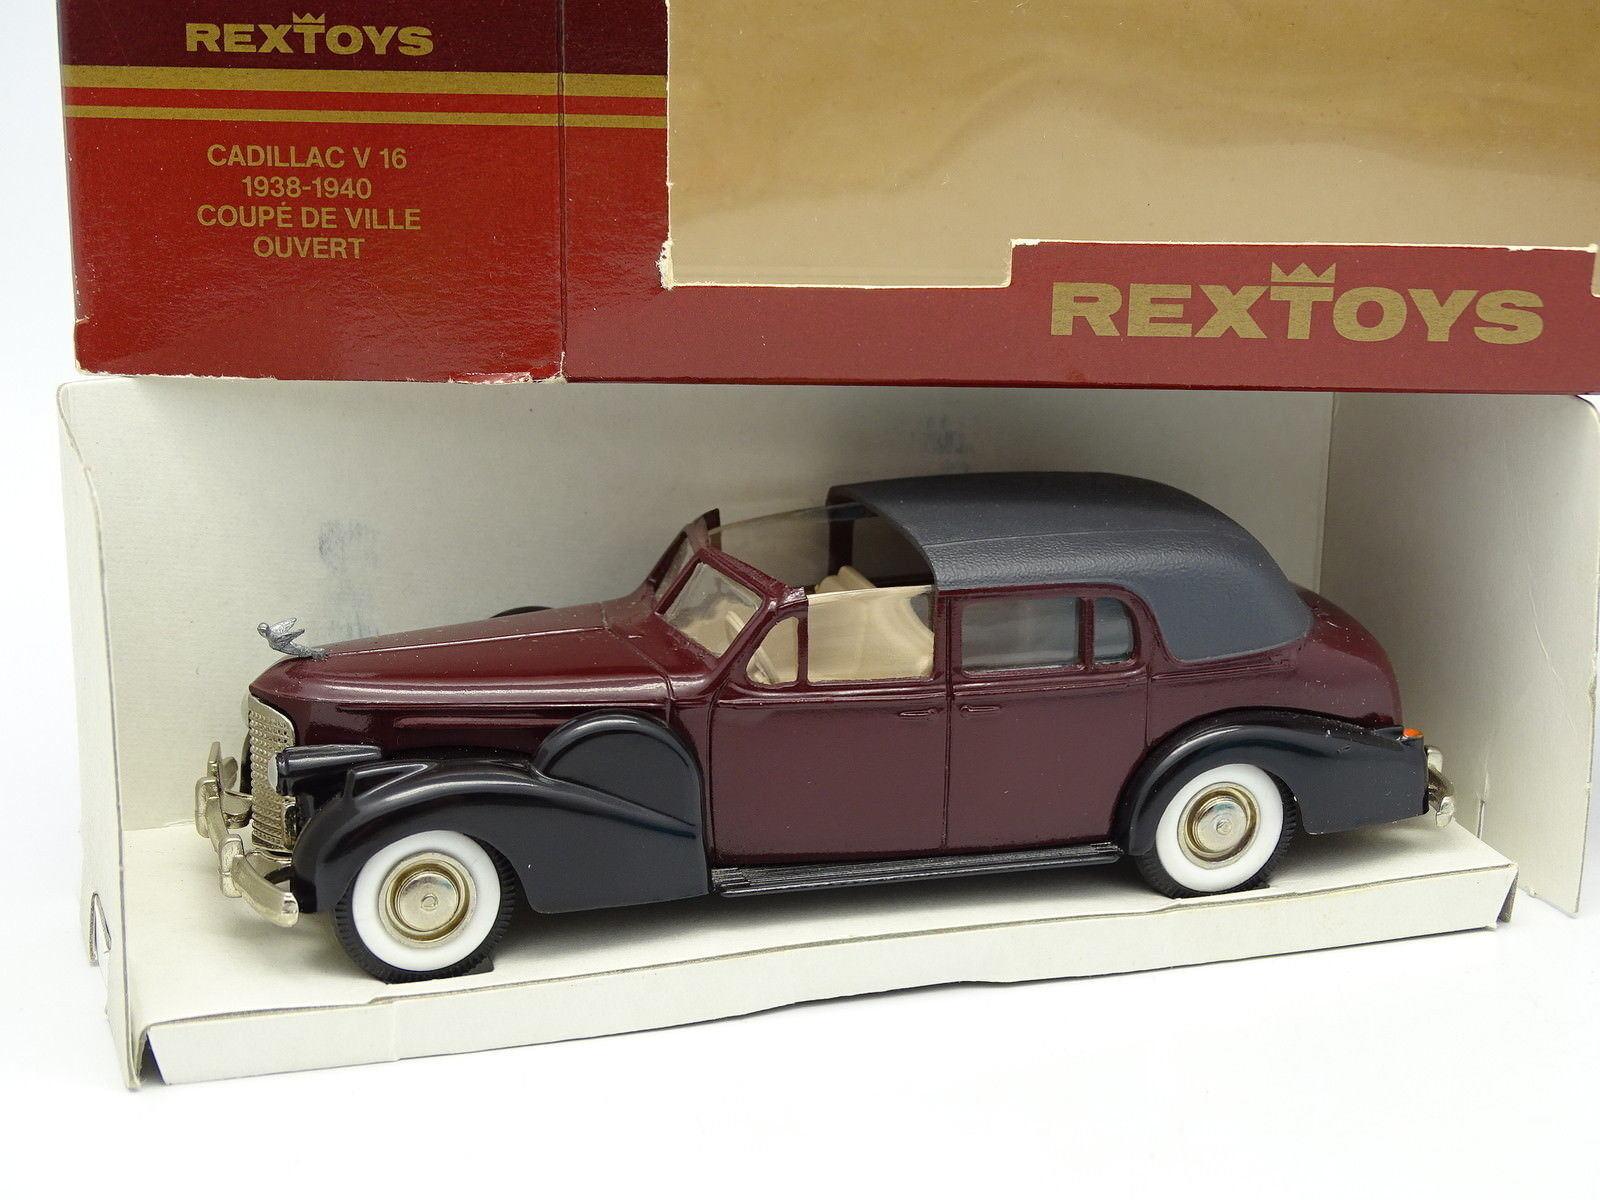 RexToys 1 43 - Cadillac V16 Coupe De Ville 1940 Ouvert Rouge